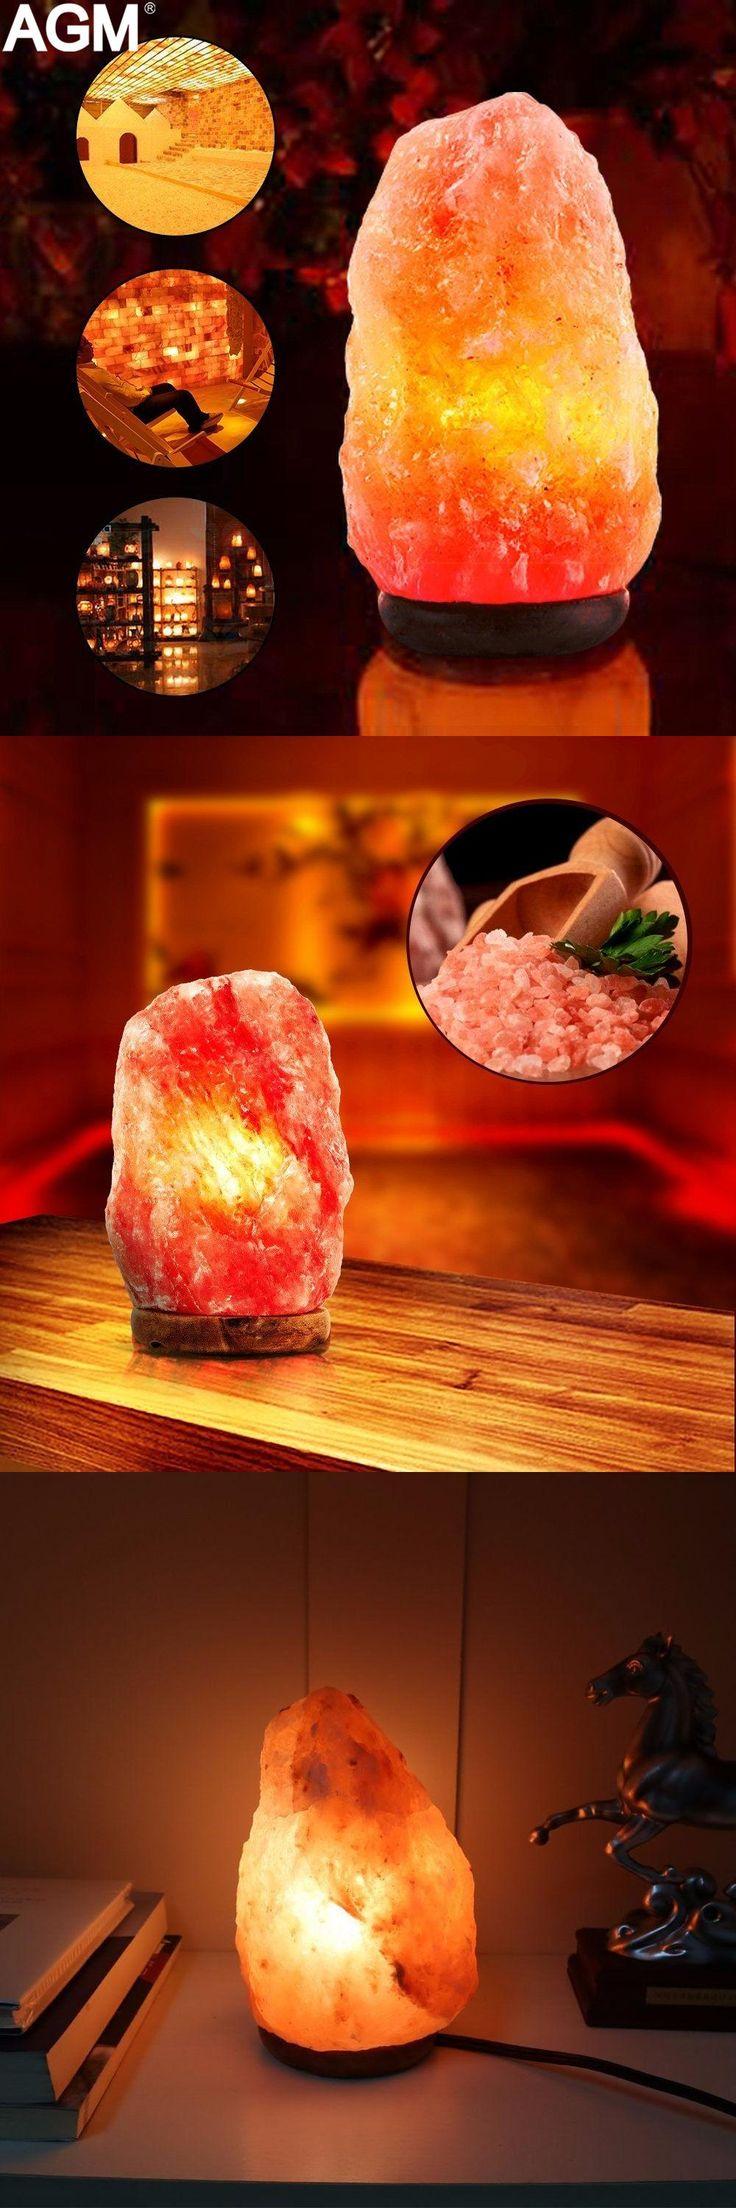 [Visit to Buy] US EU Plug USB 7 Colors Natural Himalayan Salt Lamp Air Purifier Crystal Rock Healthy Table Night Light Wood Base Desk Lampe #Advertisement